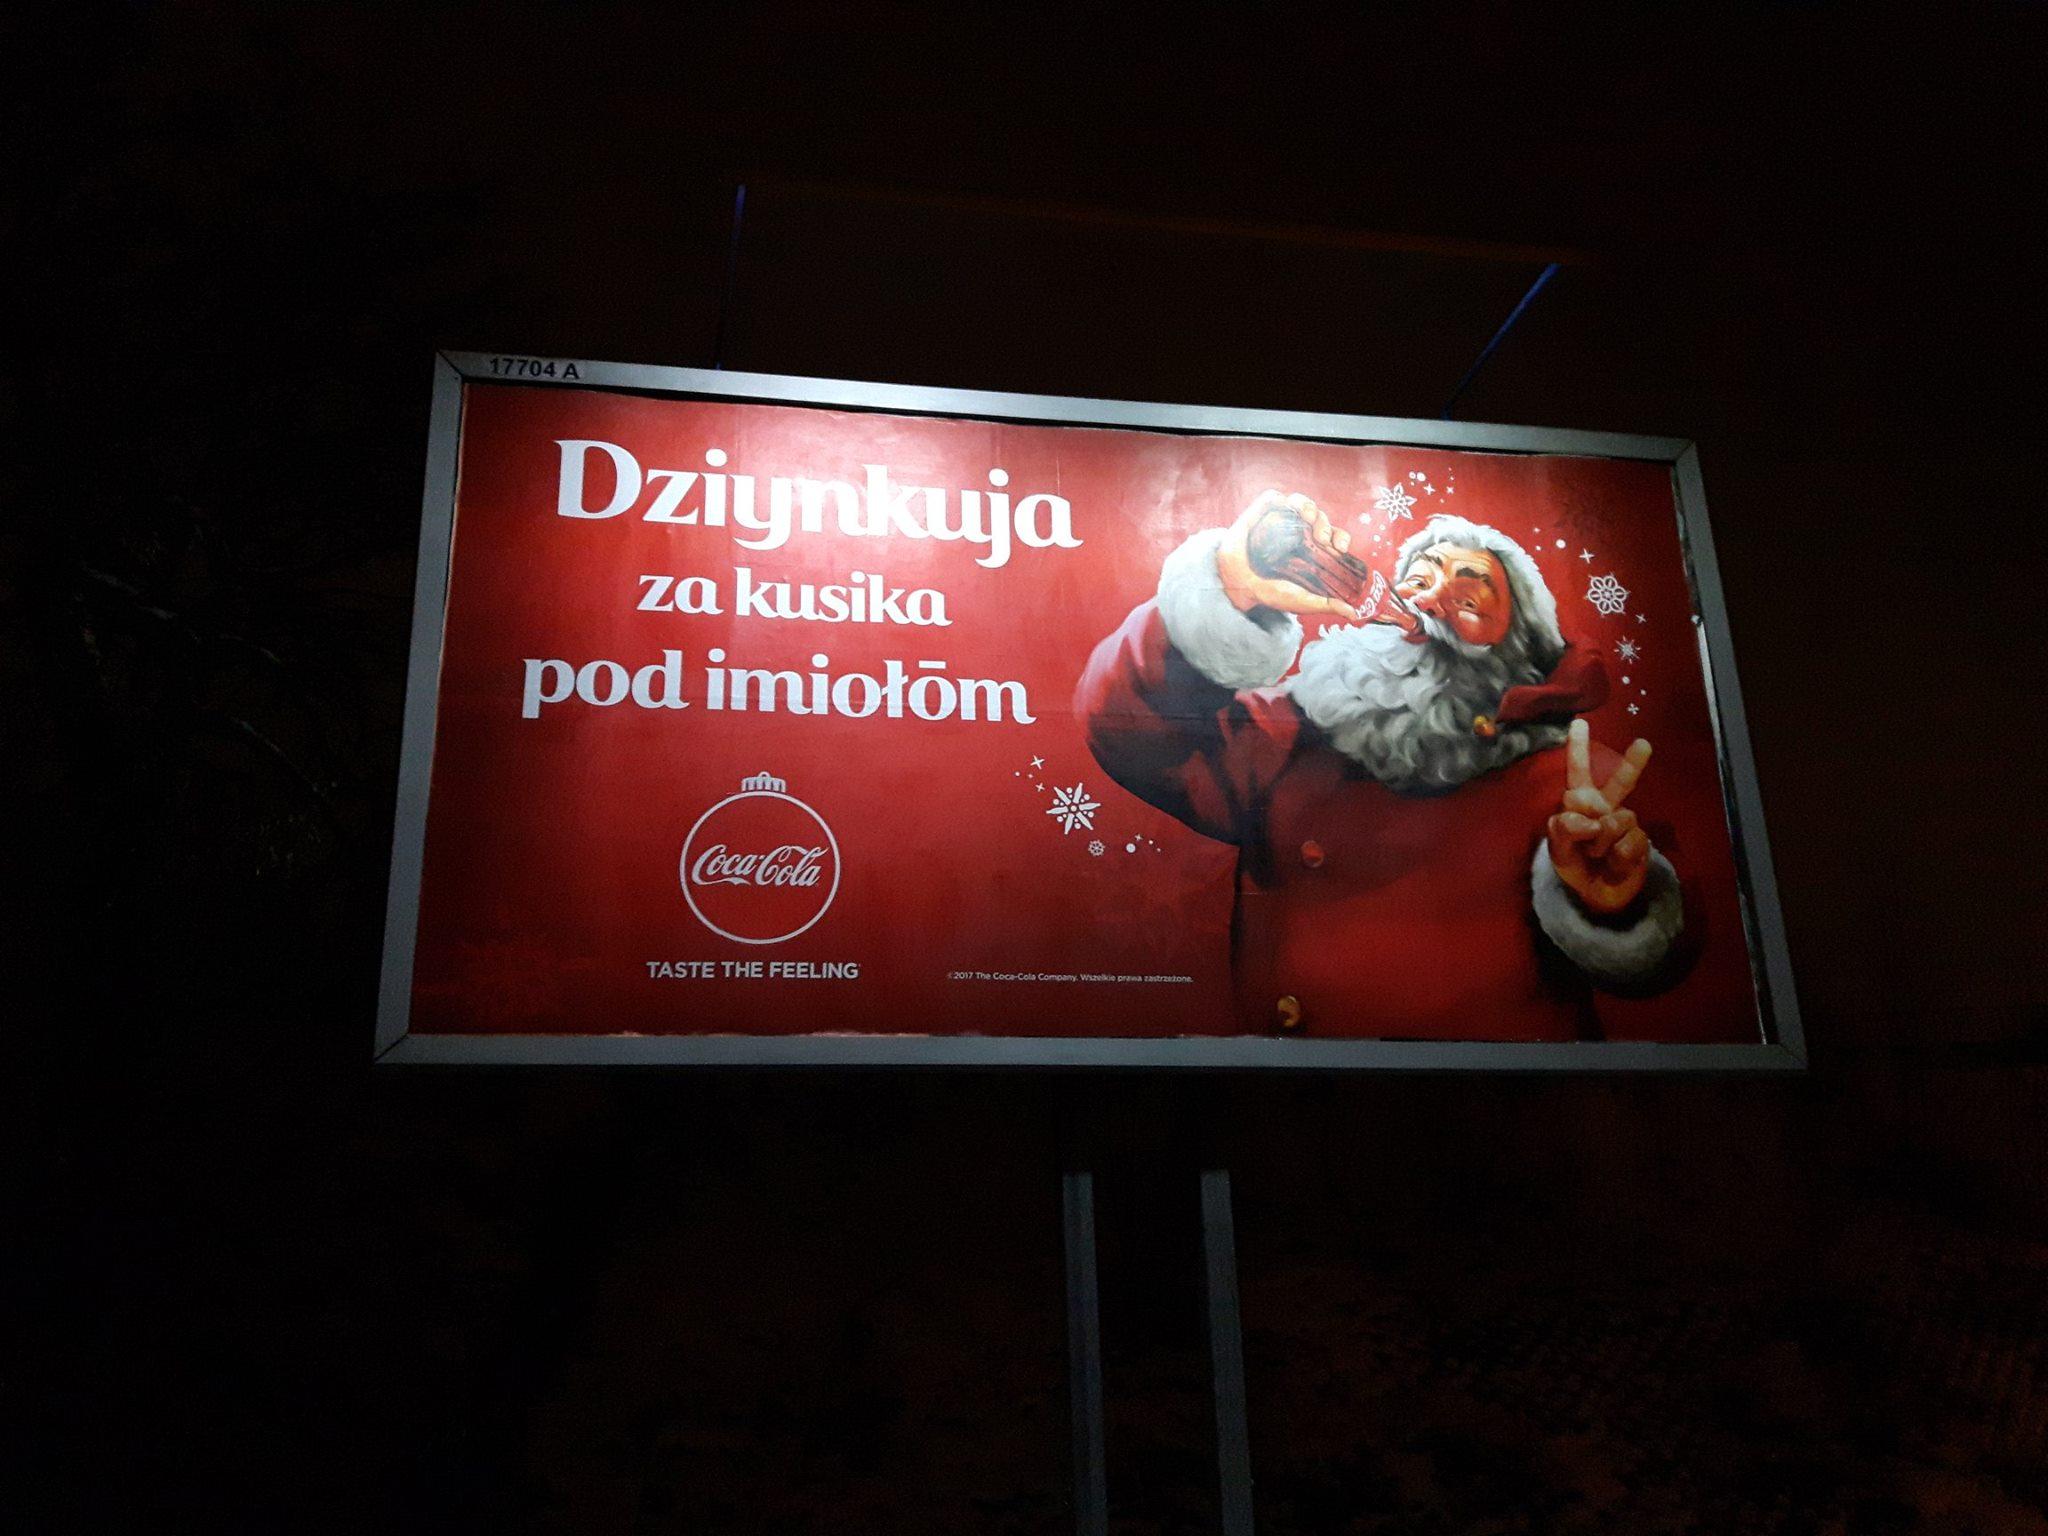 Kampania outdoorowa marki Coca-cola po śląsku